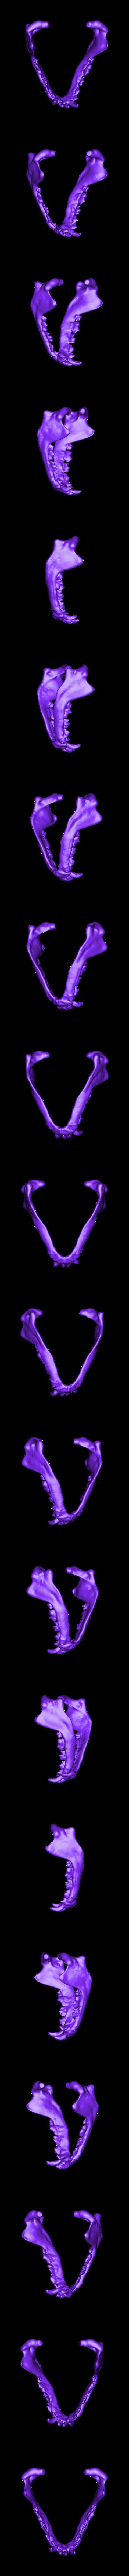 pug jaw.stl Download free STL file Pug skull • 3D printing design, voxinaudita